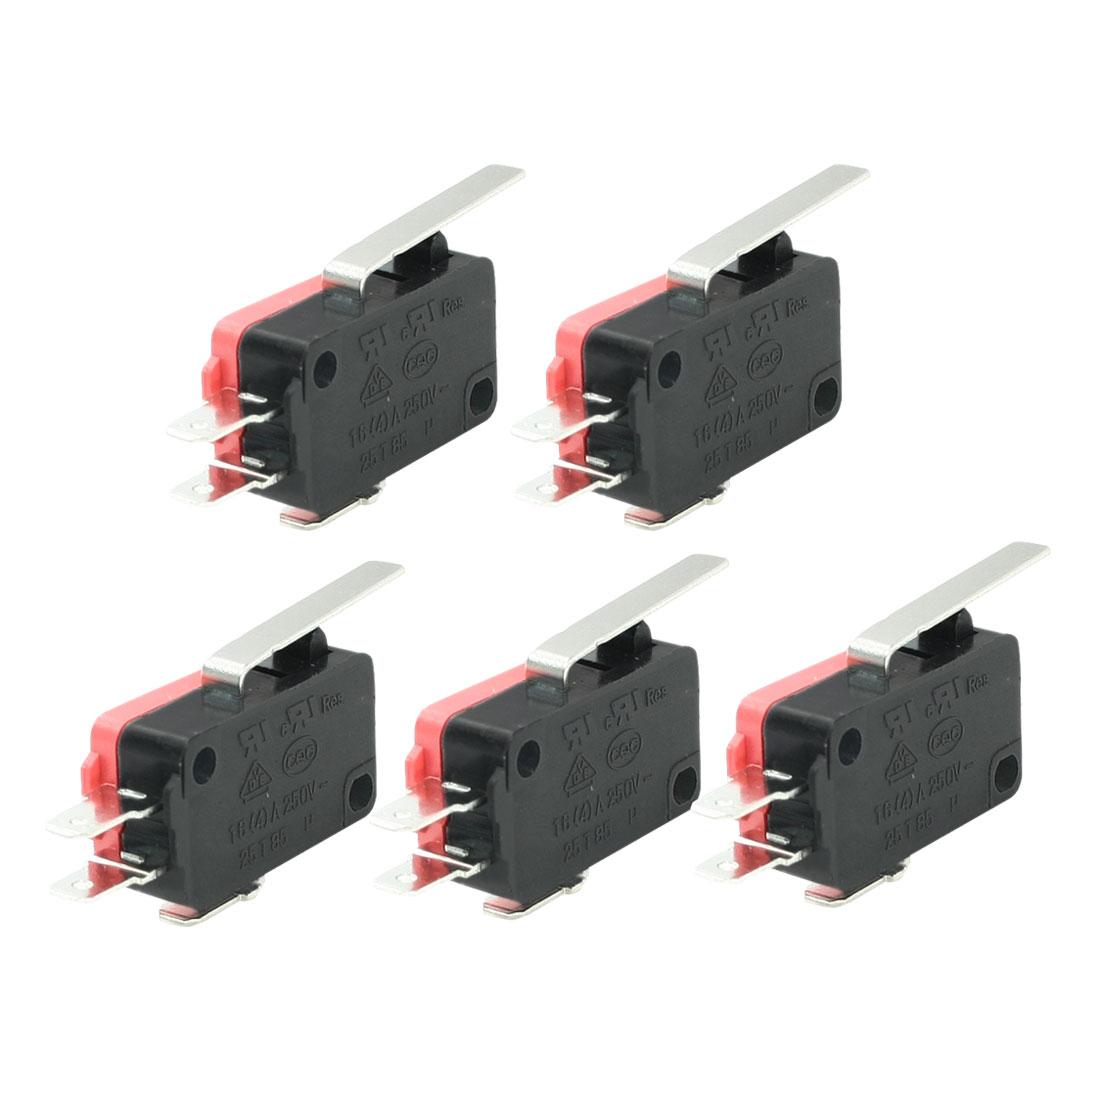 5 Pcs 1NO+1NC Srew Connector Actuator Limit Micro Switch 16A 4A 250VAC